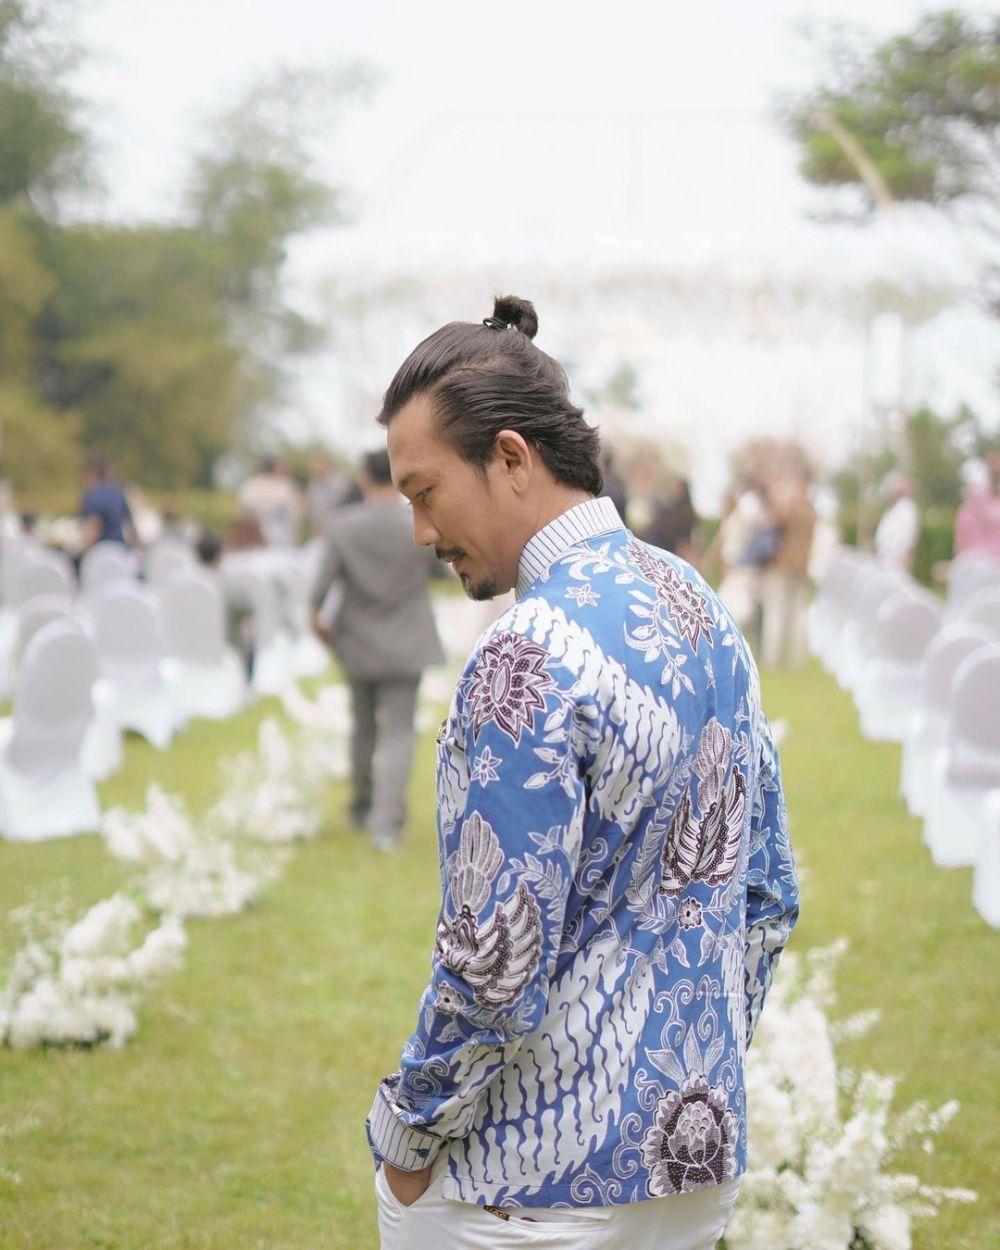 Resmi Menikah, 10 Potret Denny Sumargo yang Kian Gagah dan Memesona